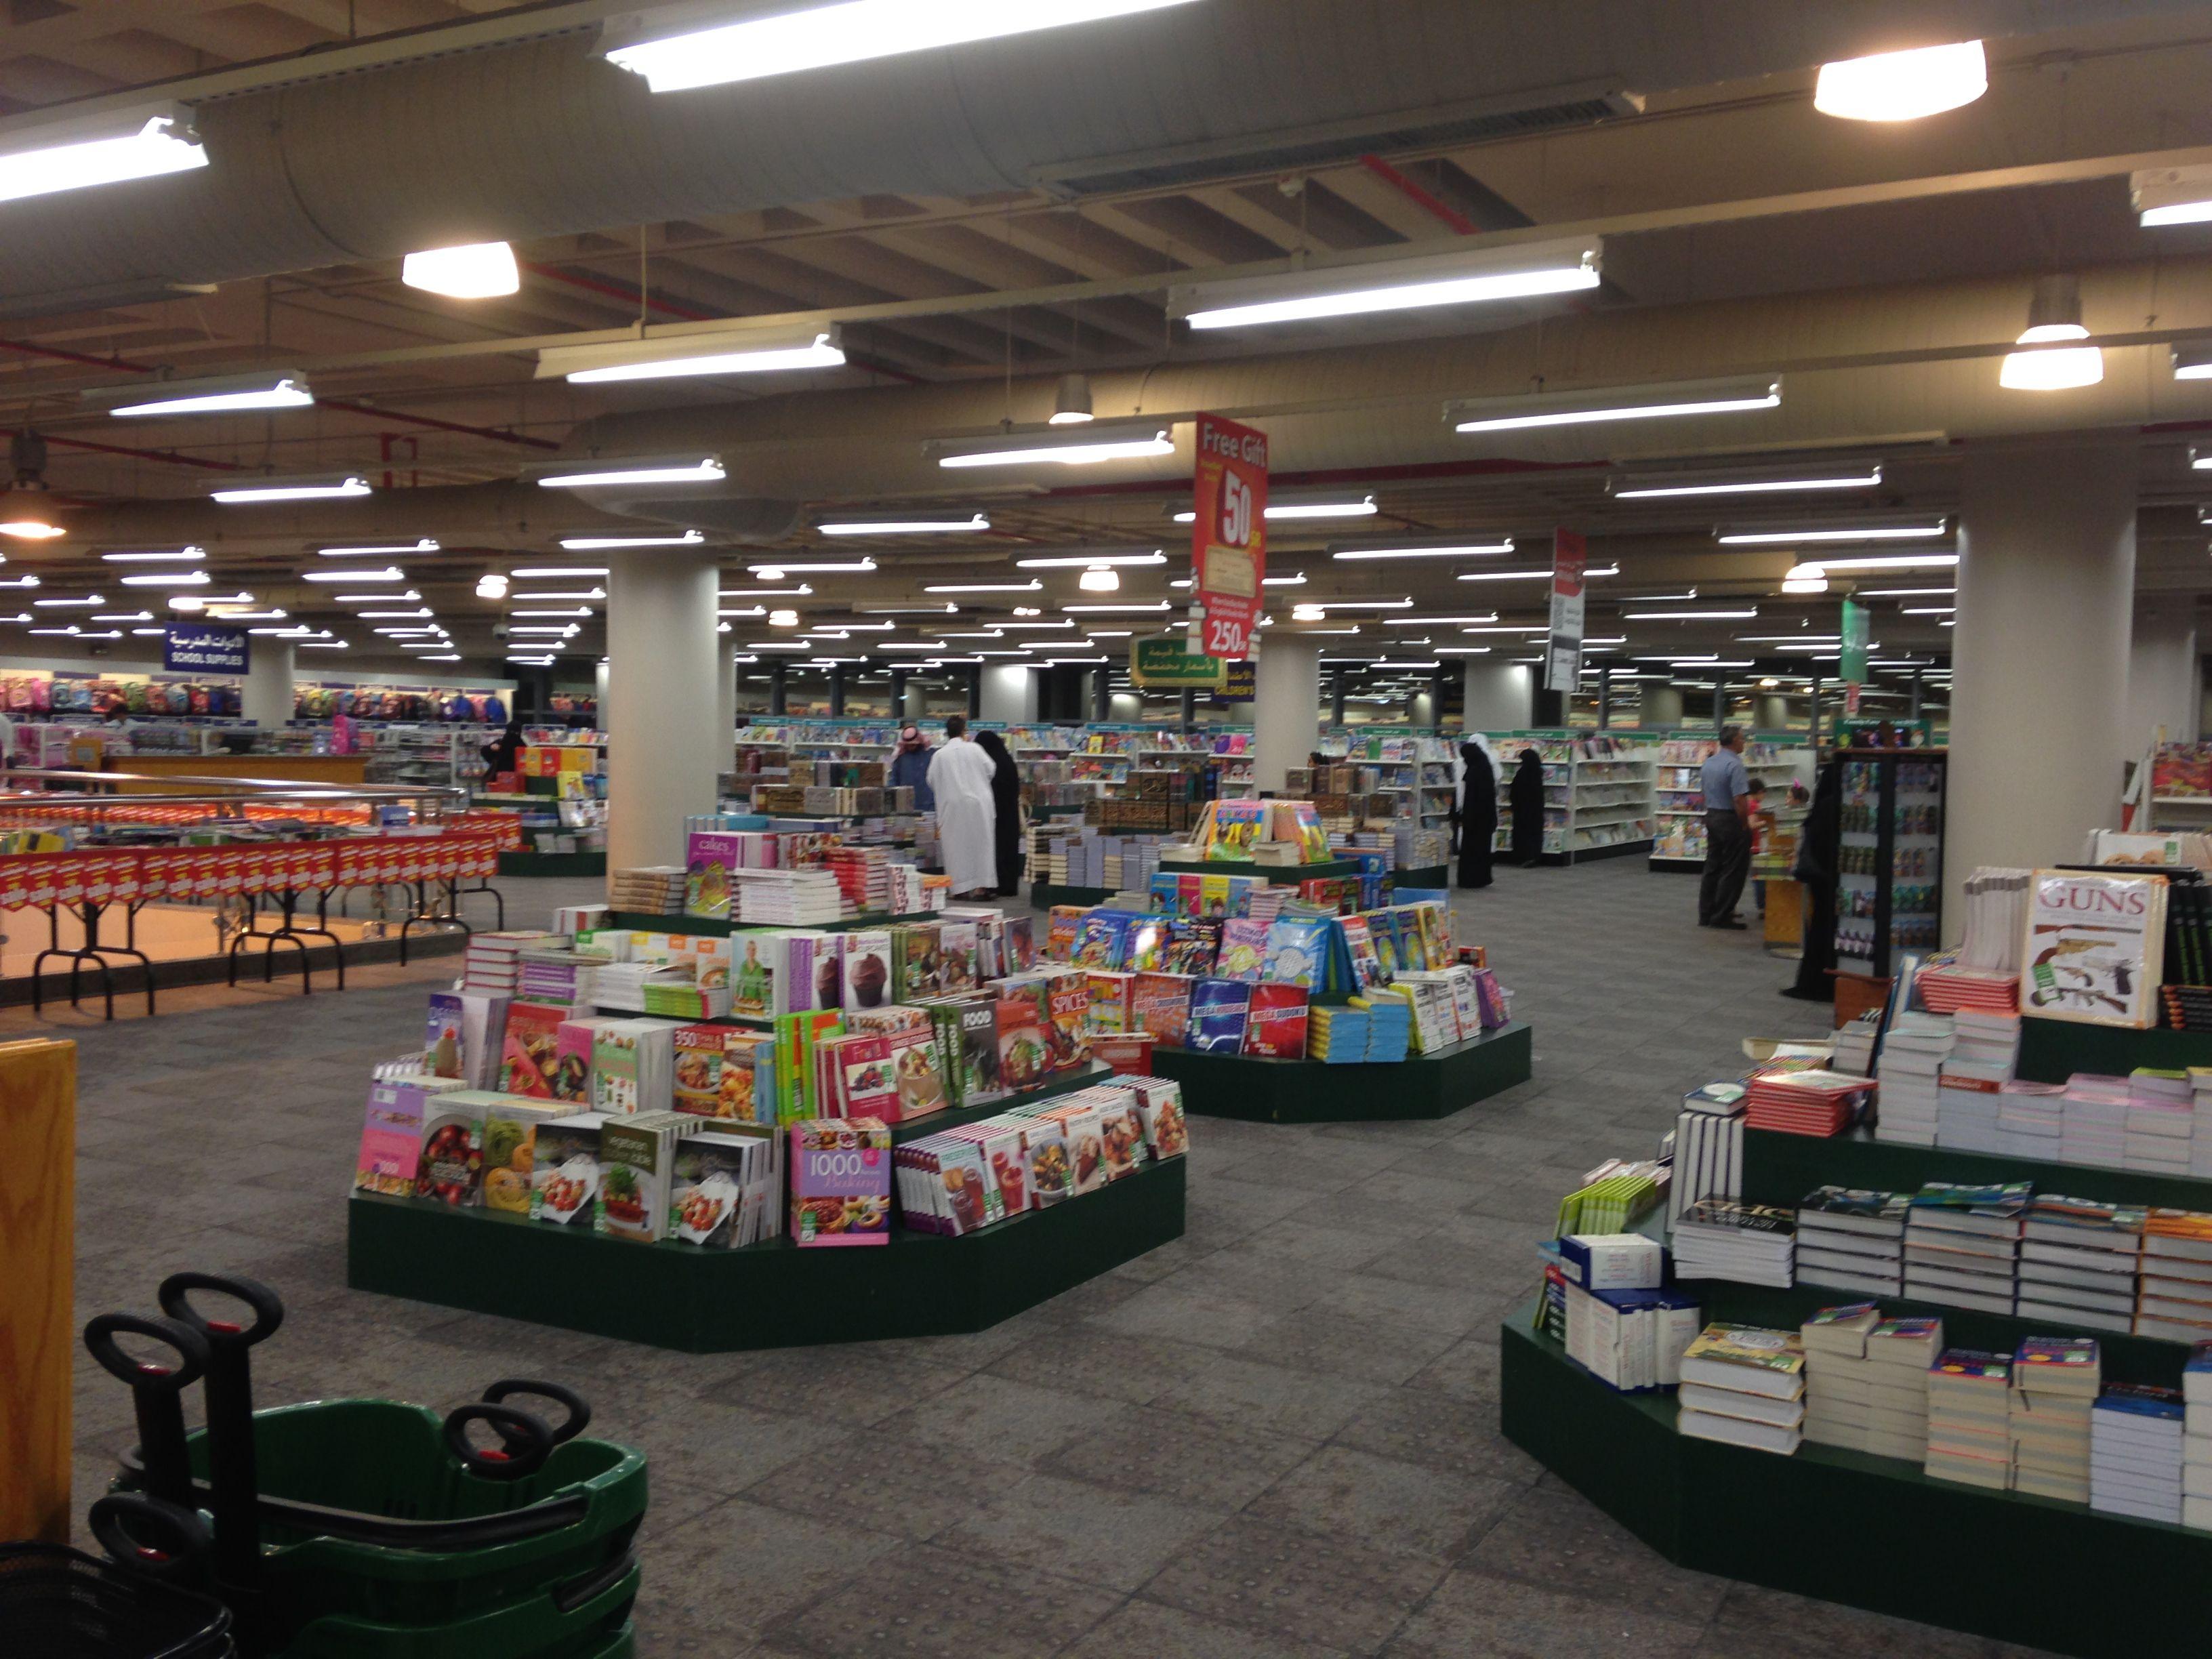 Visit To Jarir Bookstore Riyadh Saudi Arabia Photos Bookstore Saudi Arabia Photos Riyadh